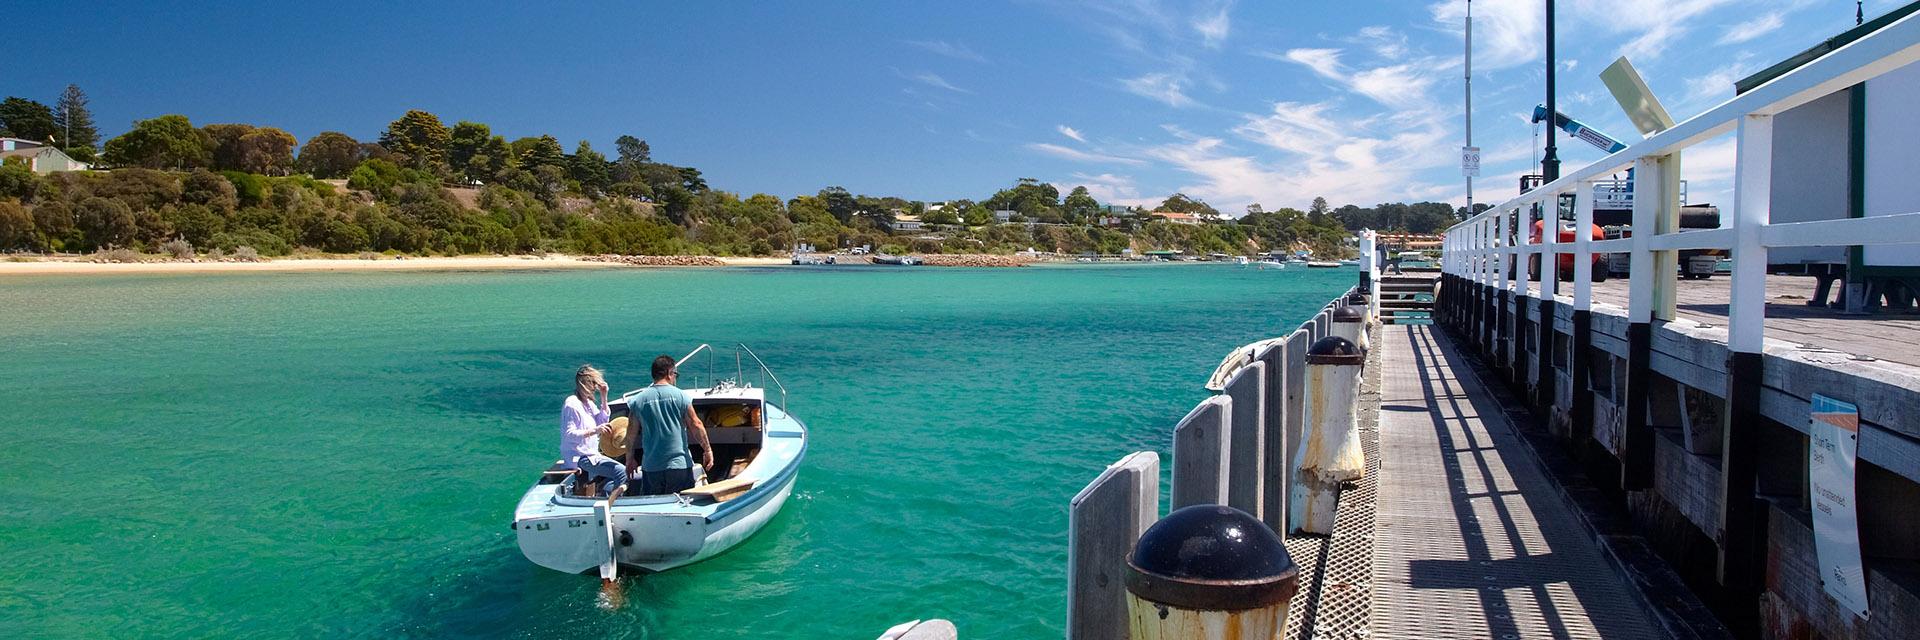 Sorrento Pier, Mornington Peninsula, Victoria, Australia